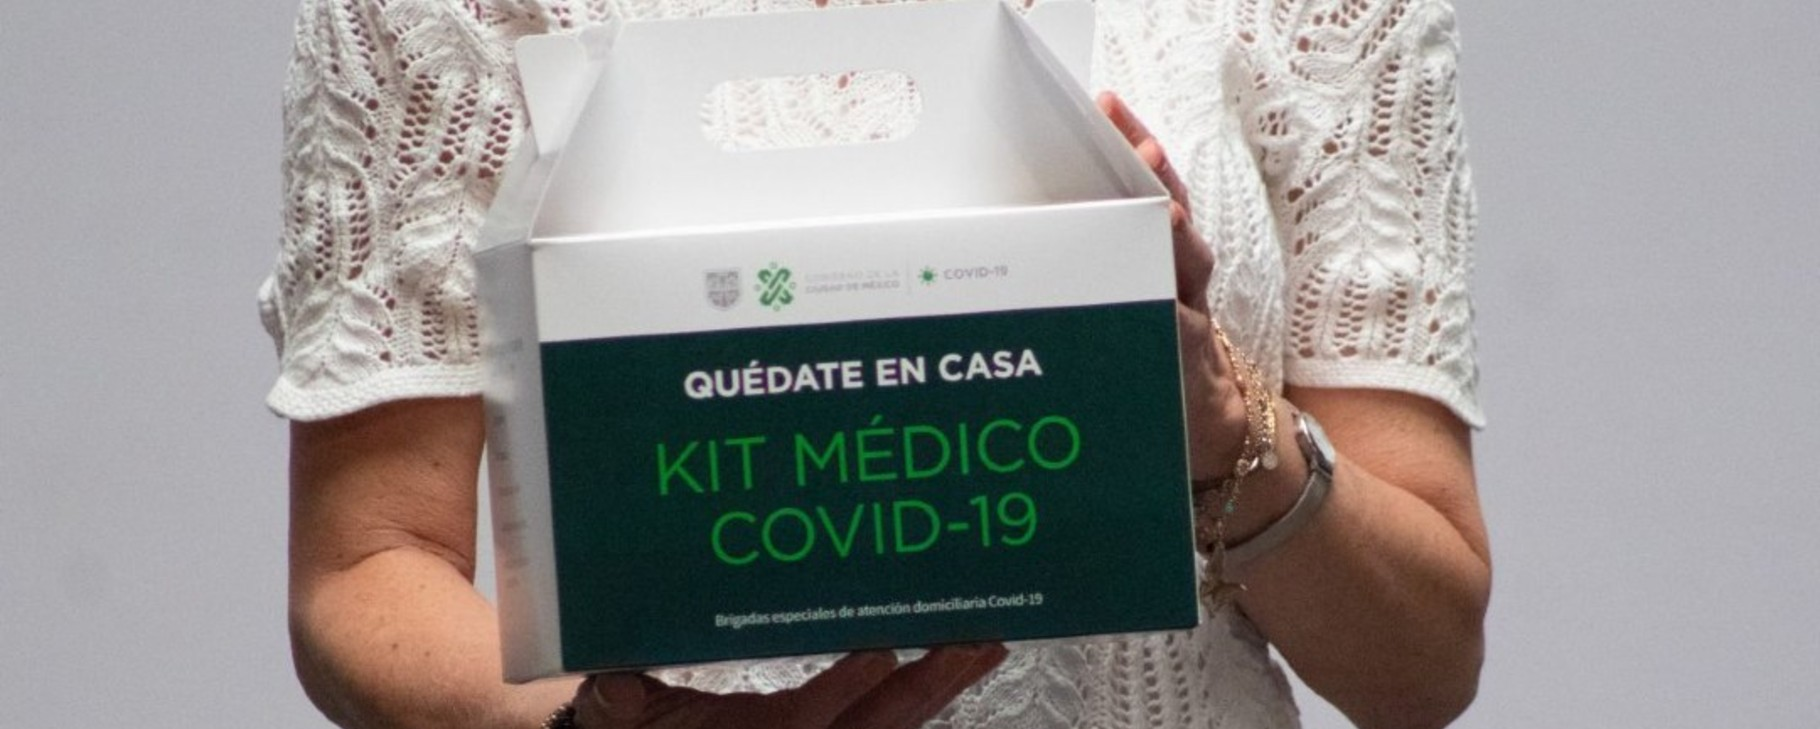 cdmx coronavirus